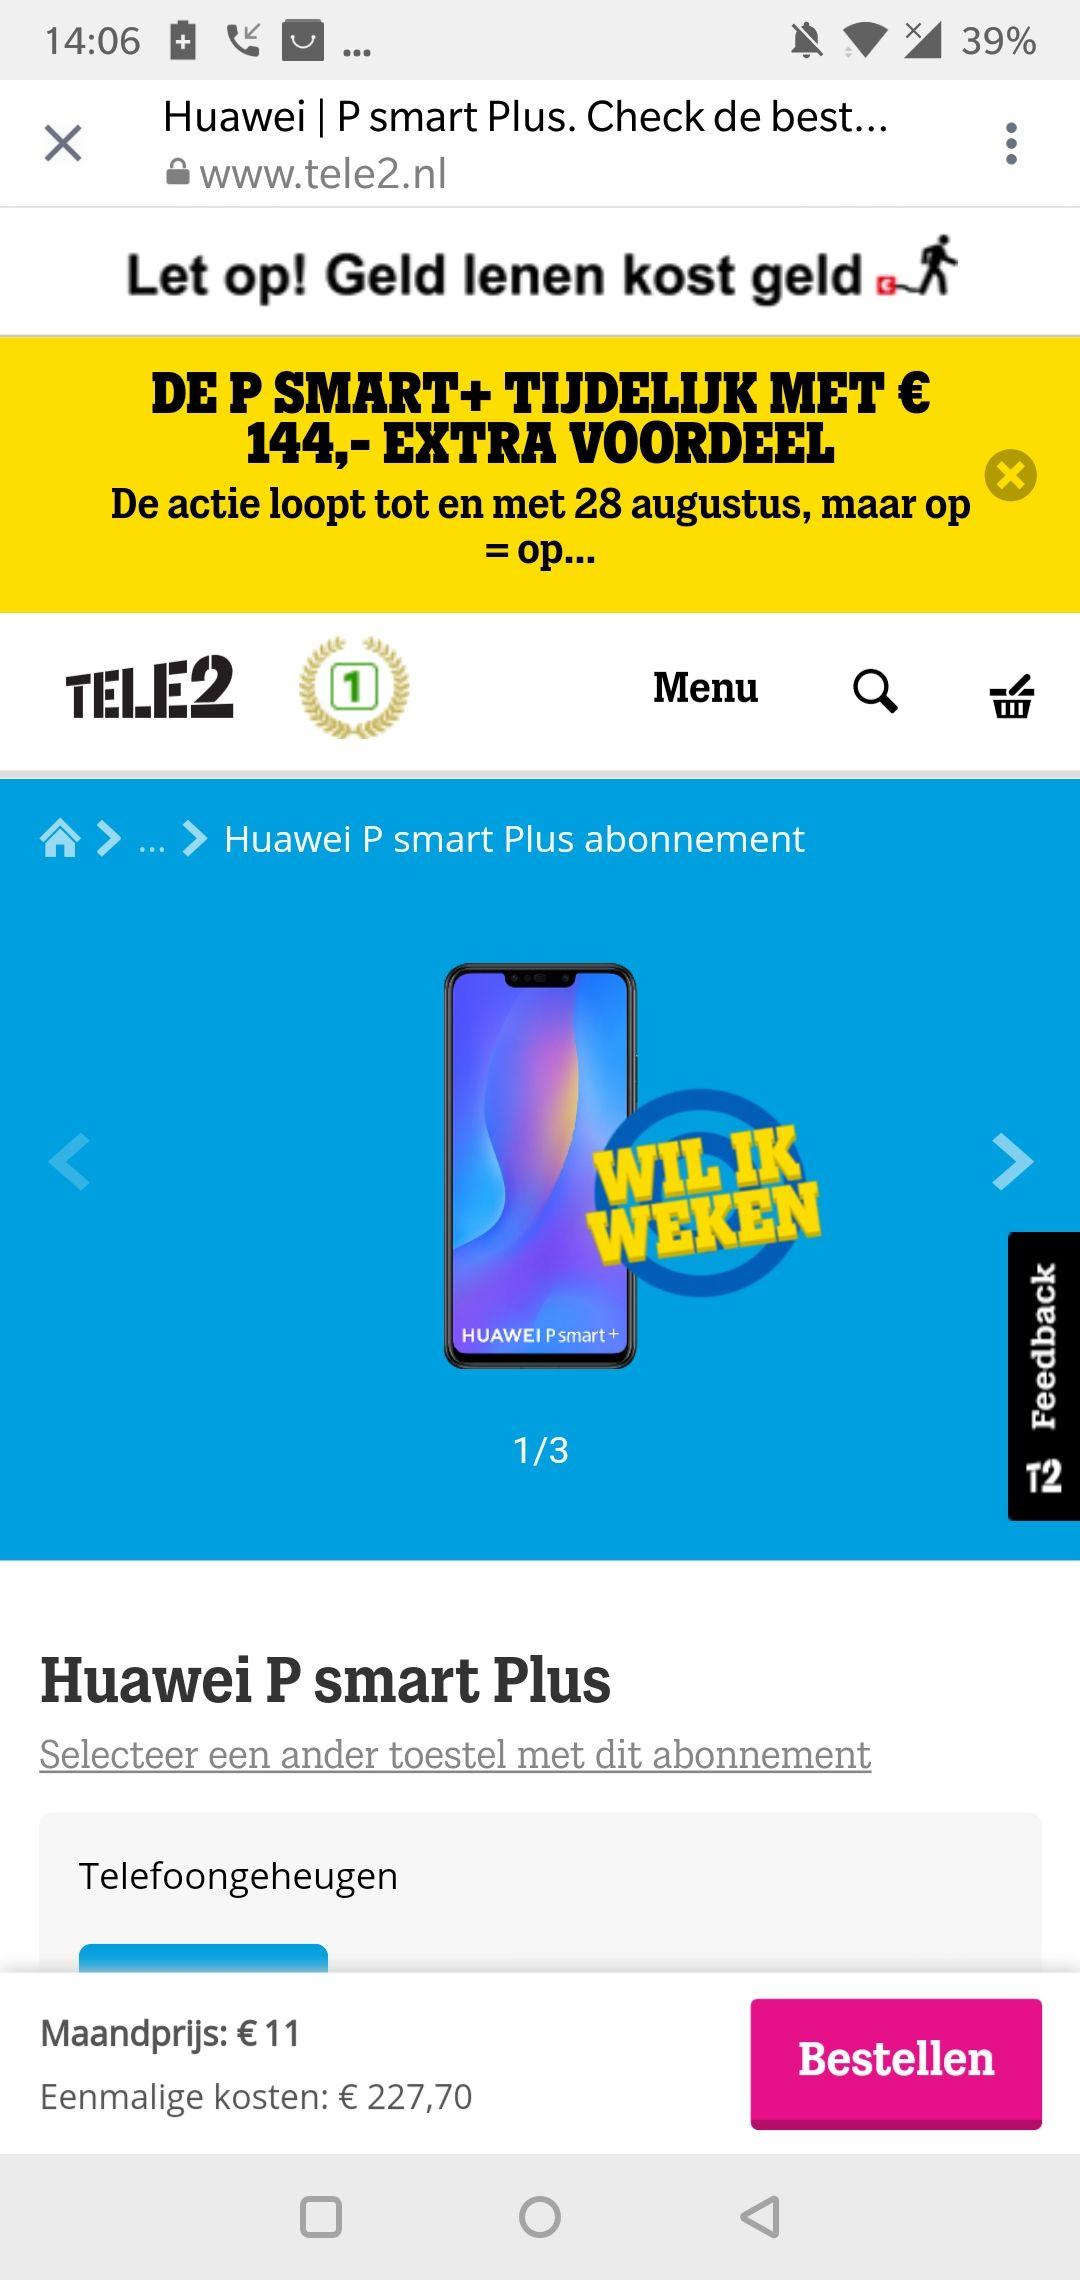 Huawei p smart PLUS tijdelijk 144 EU extra korting